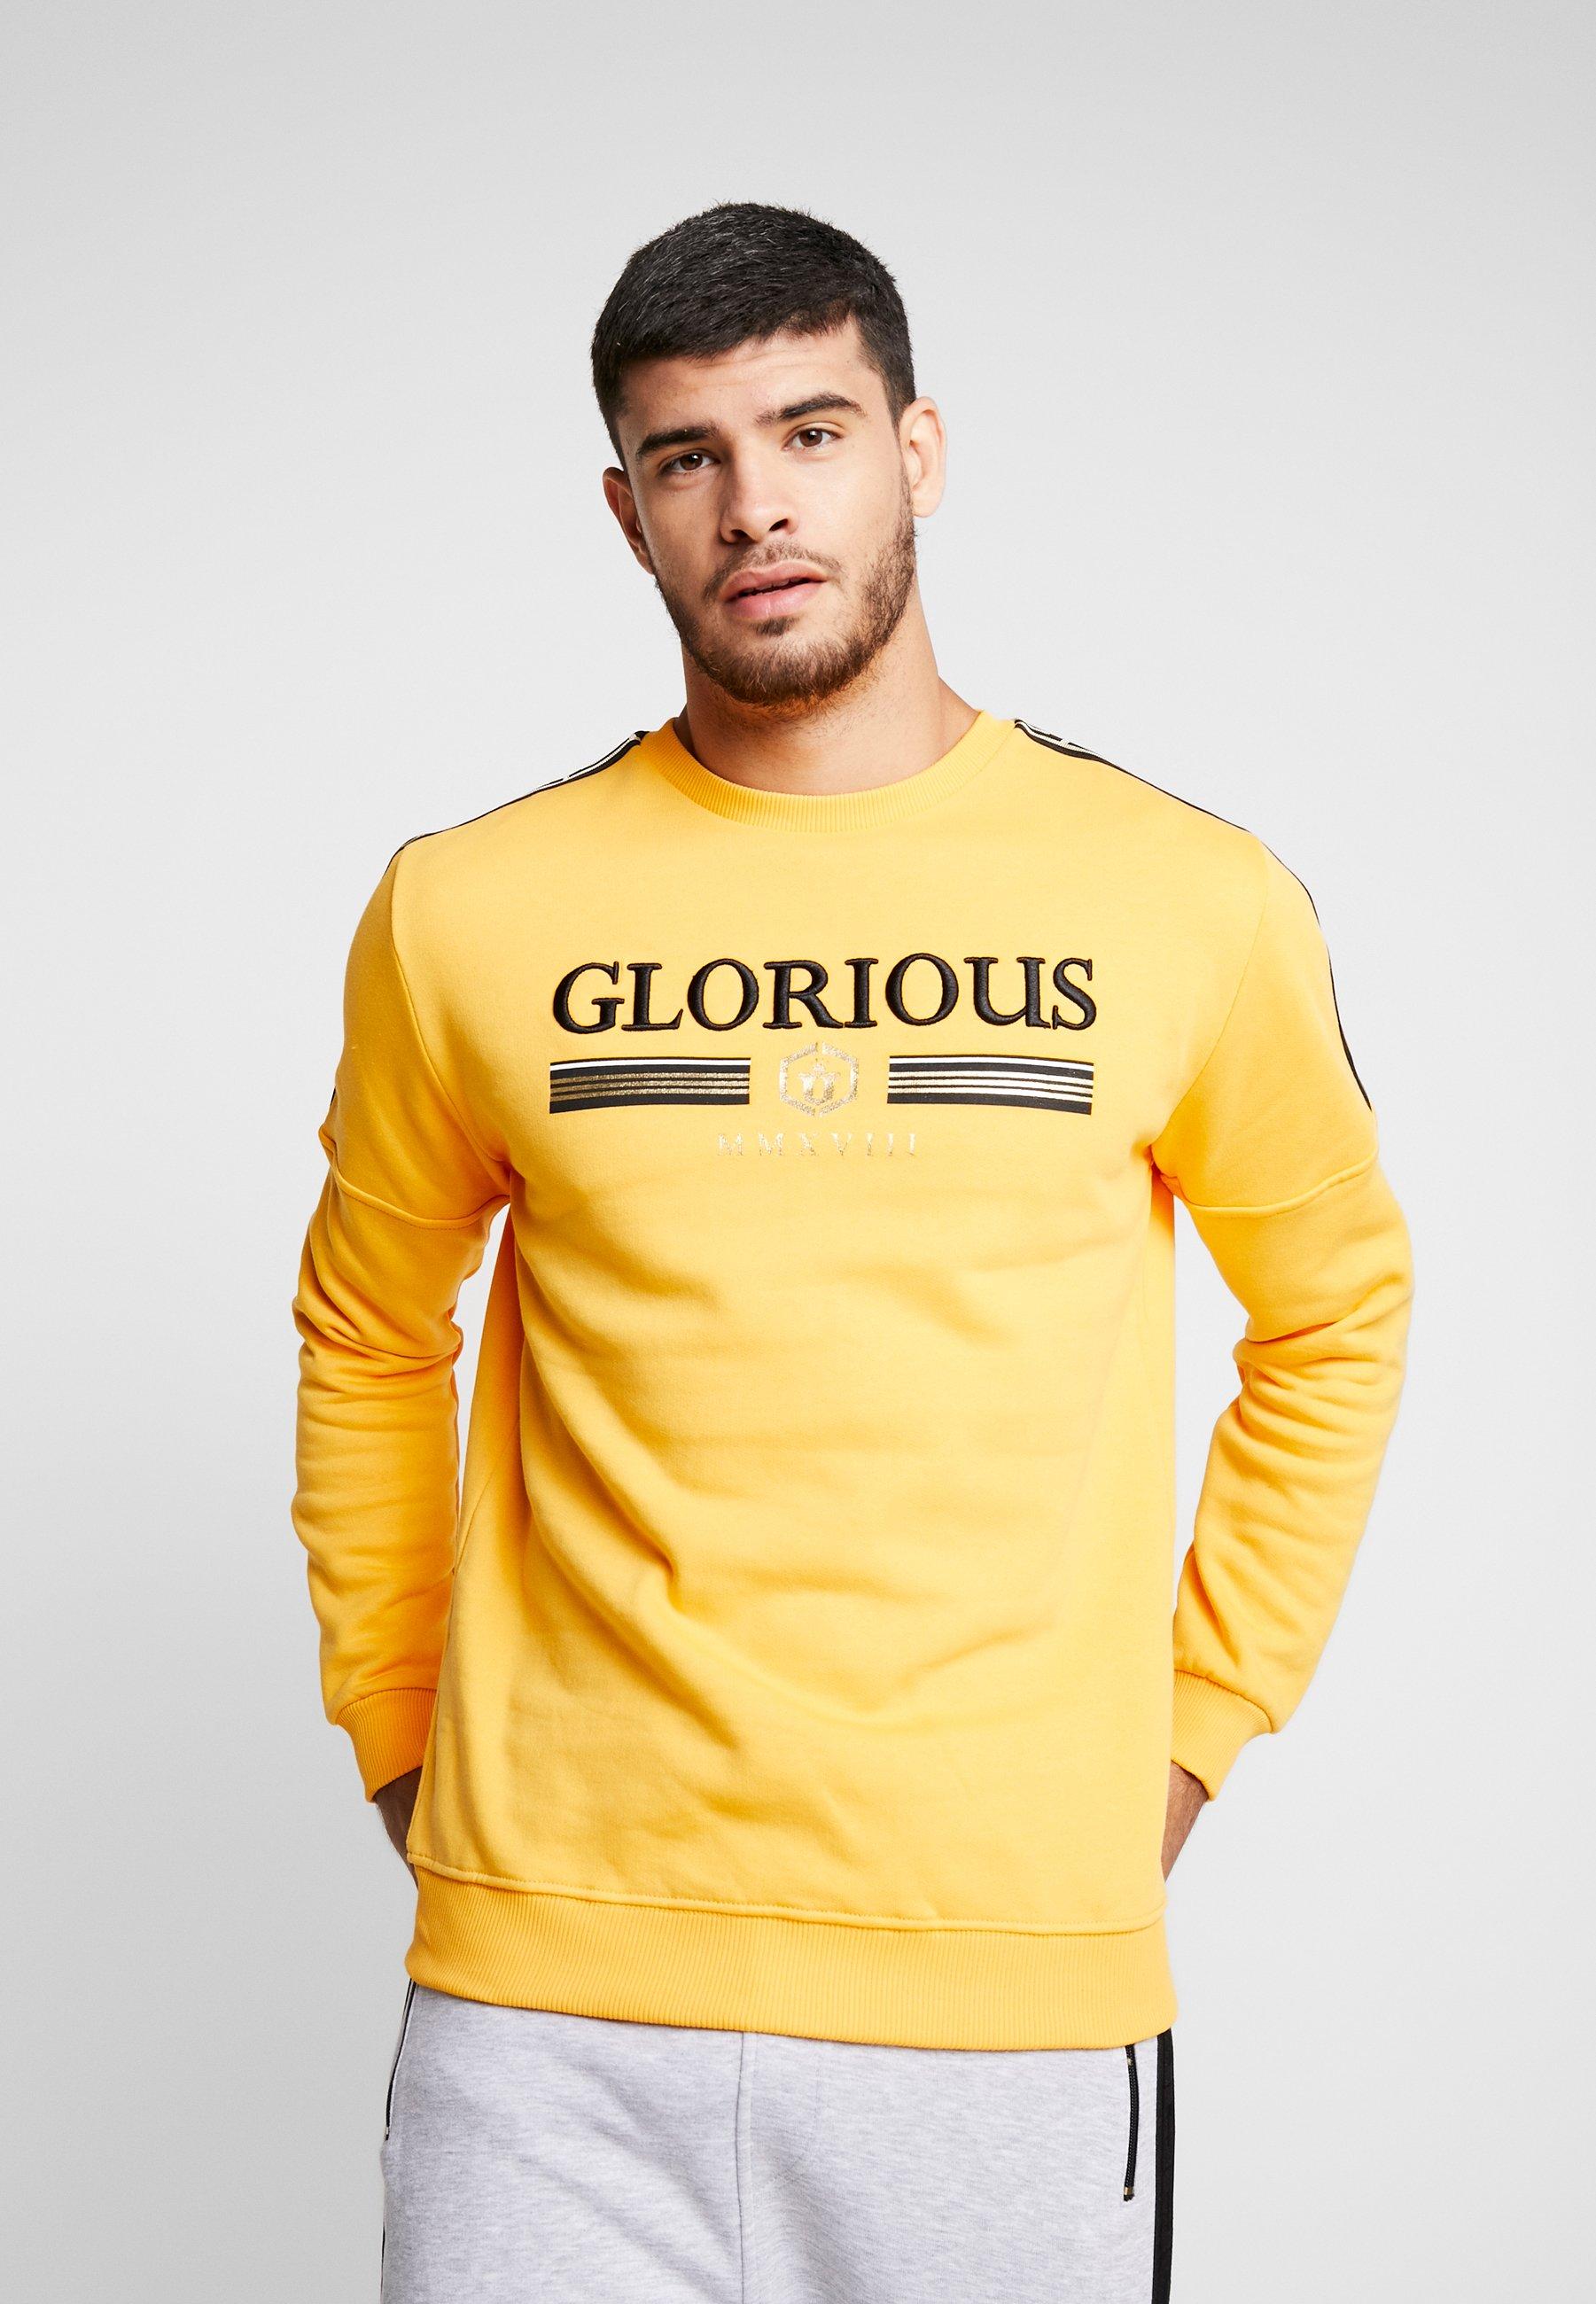 Glorious Glorious Gangsta CrewSweatshirt Gangsta Kalk Yellow gfY7y6b